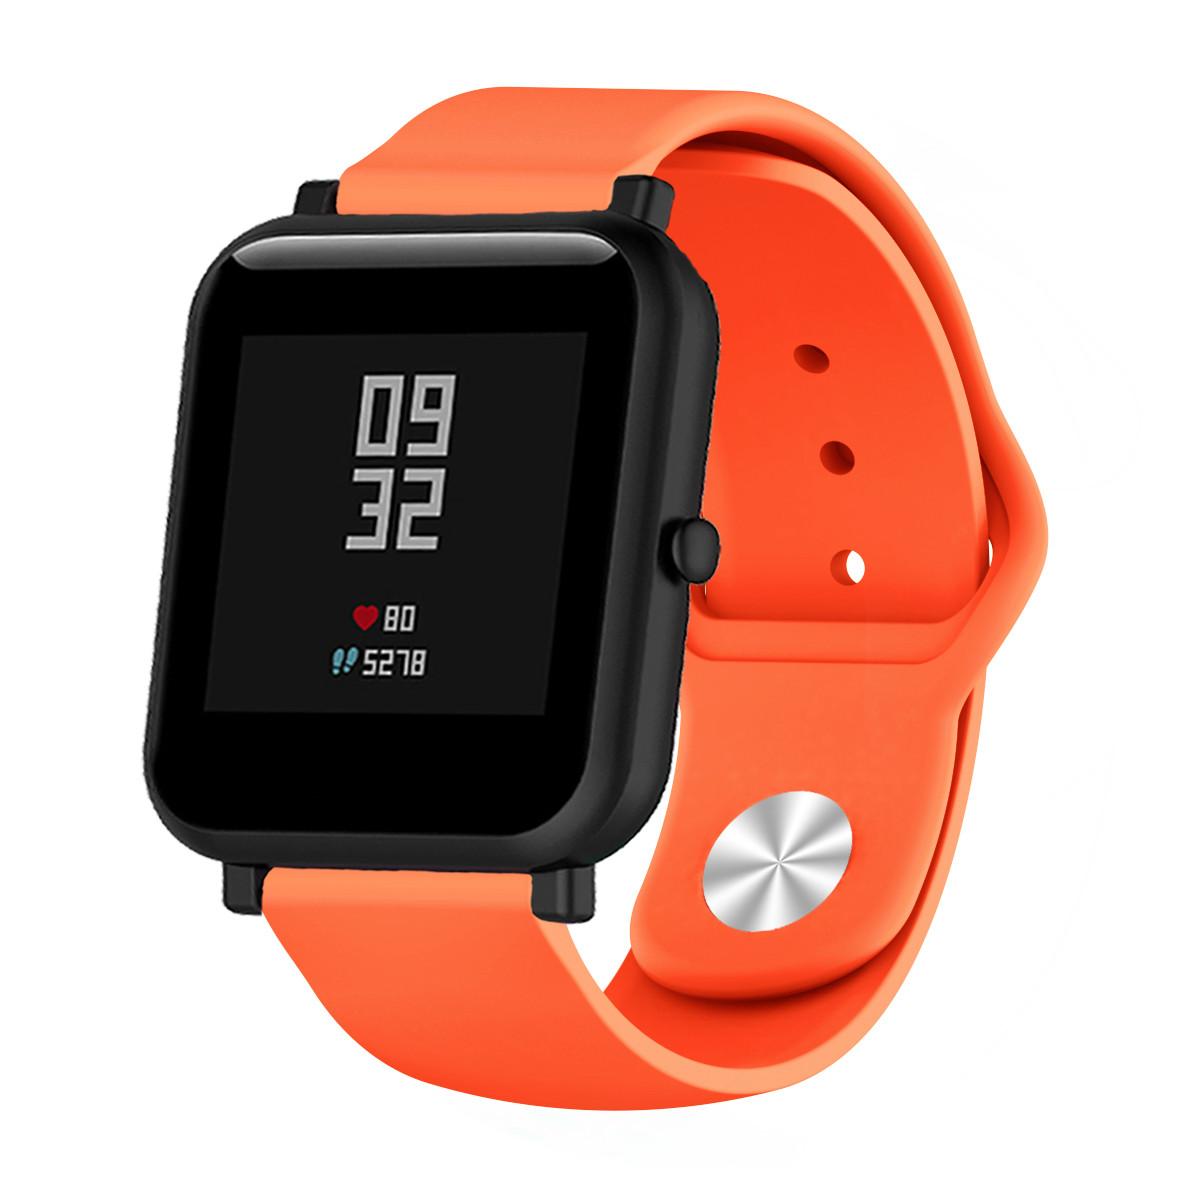 Ремешок Sport Nike Youth для Xiaomi AMAZFIT Bip / 20 мм Orange (Оранжевый)